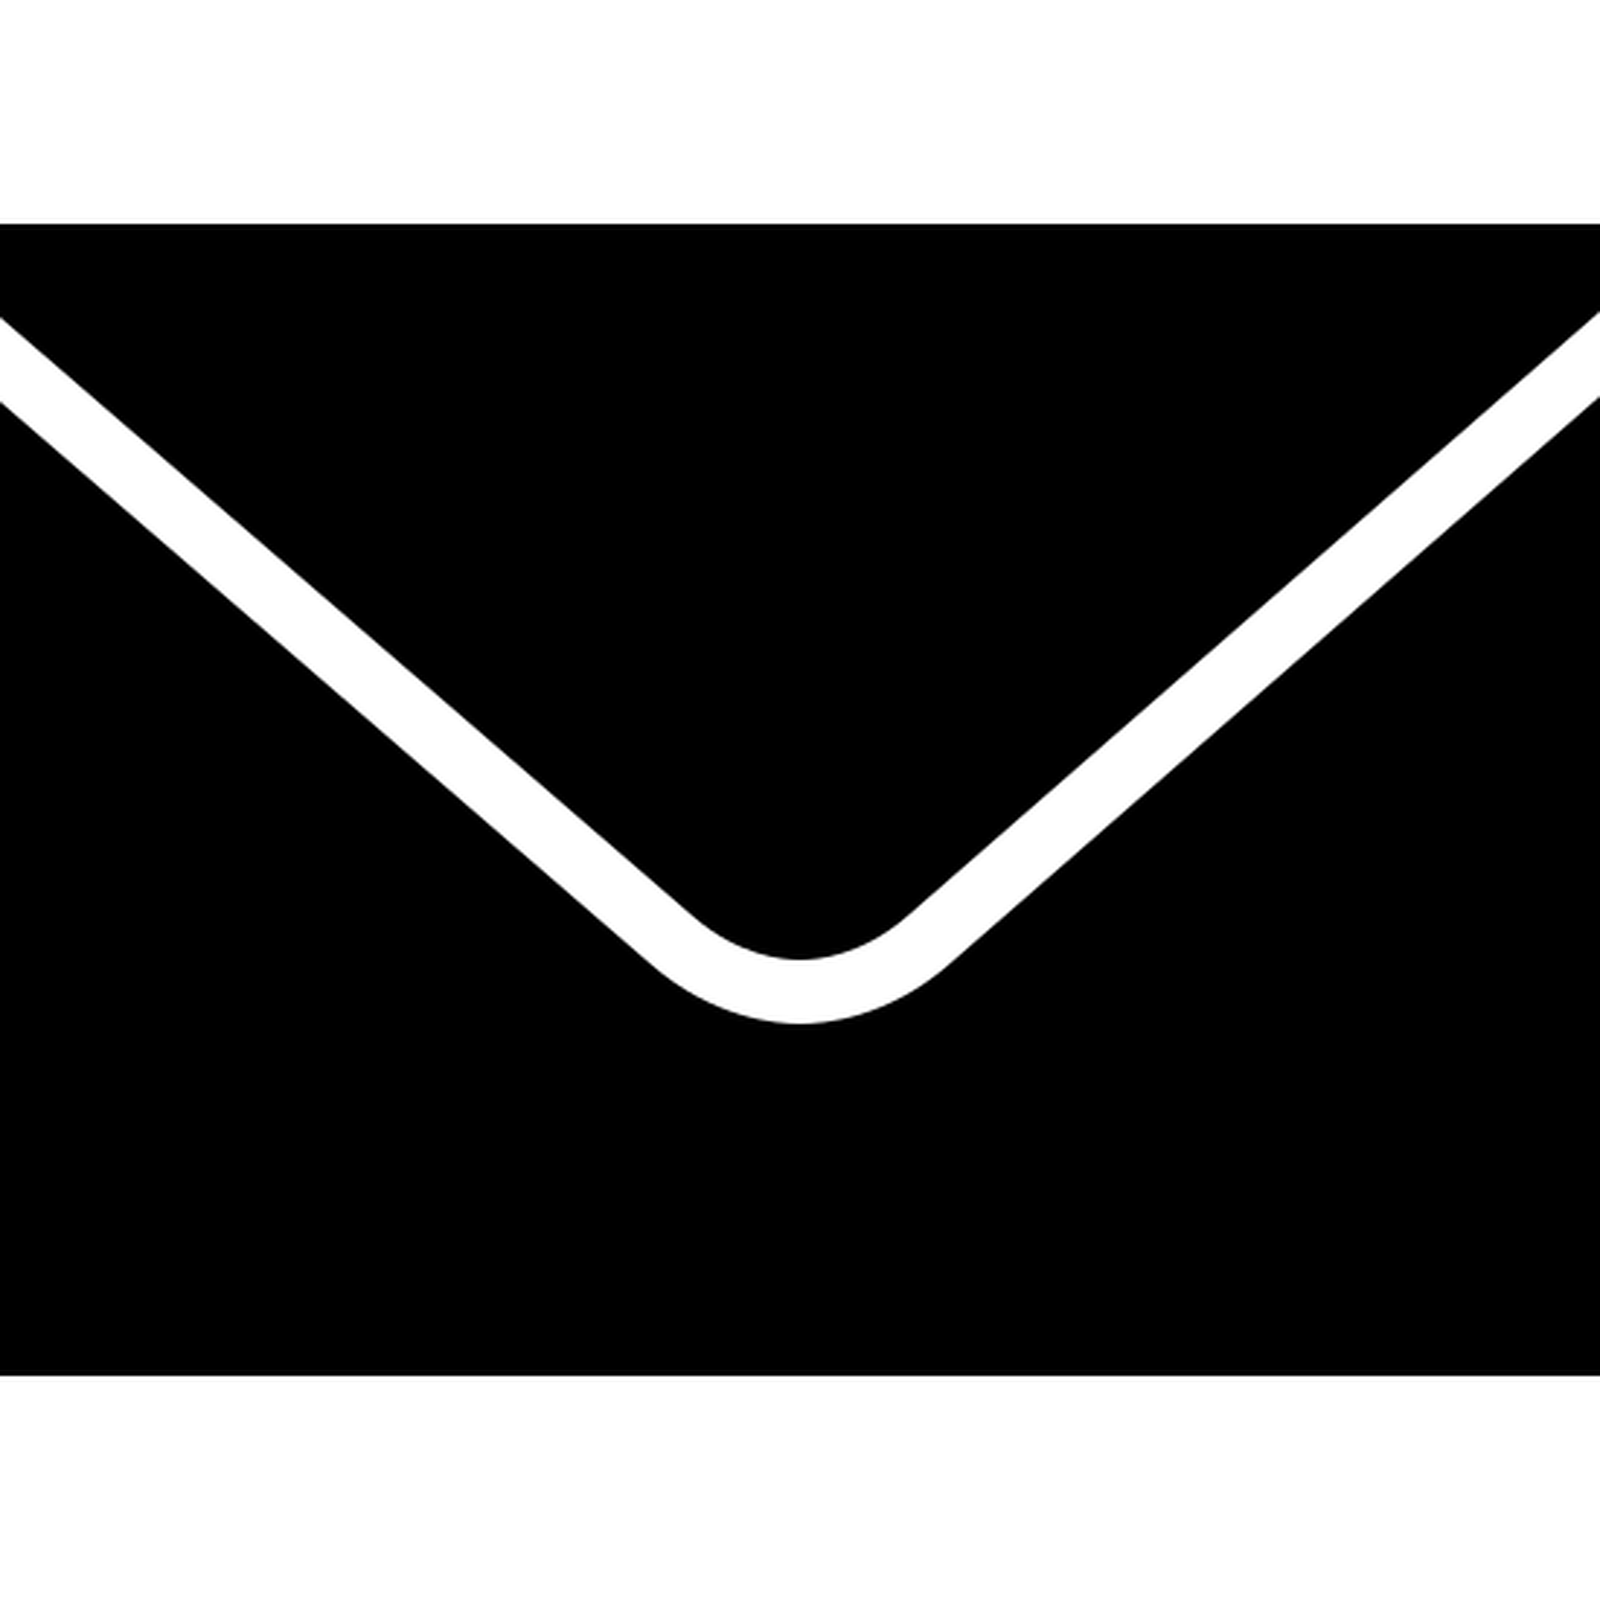 Envelope Filled icon